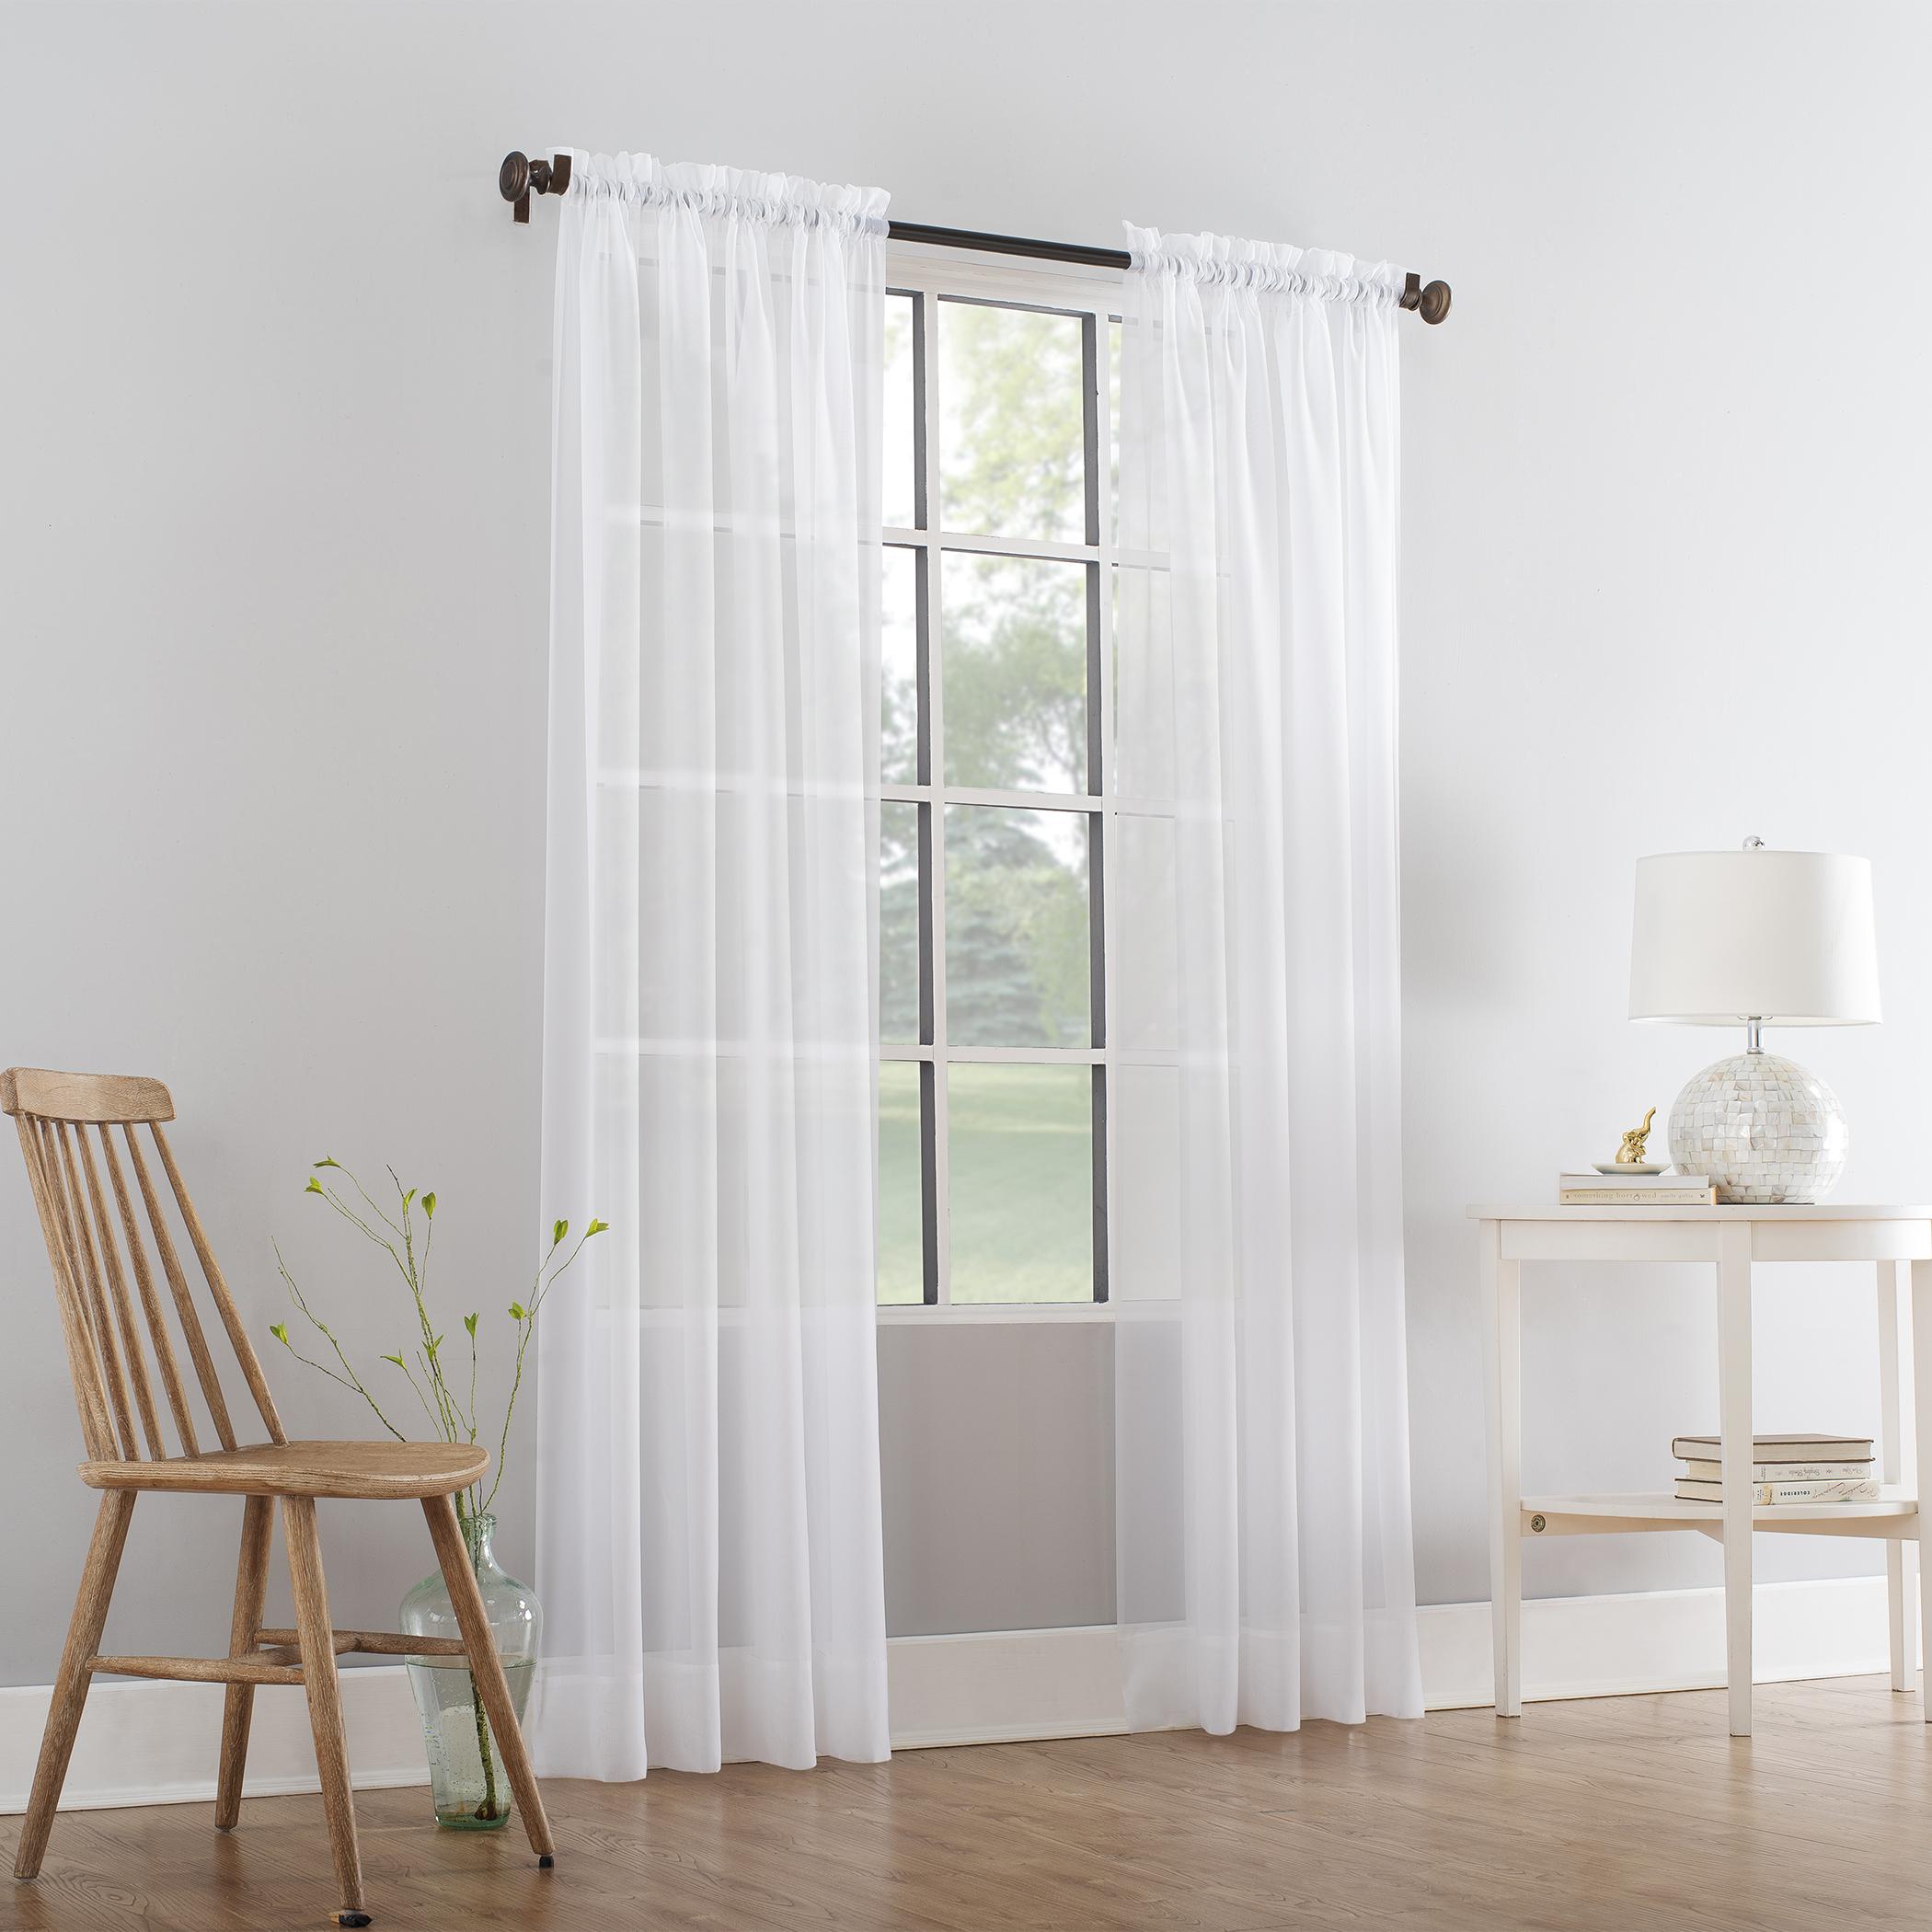 Mainstays Marjorie Sheer Voile Curtain Panel